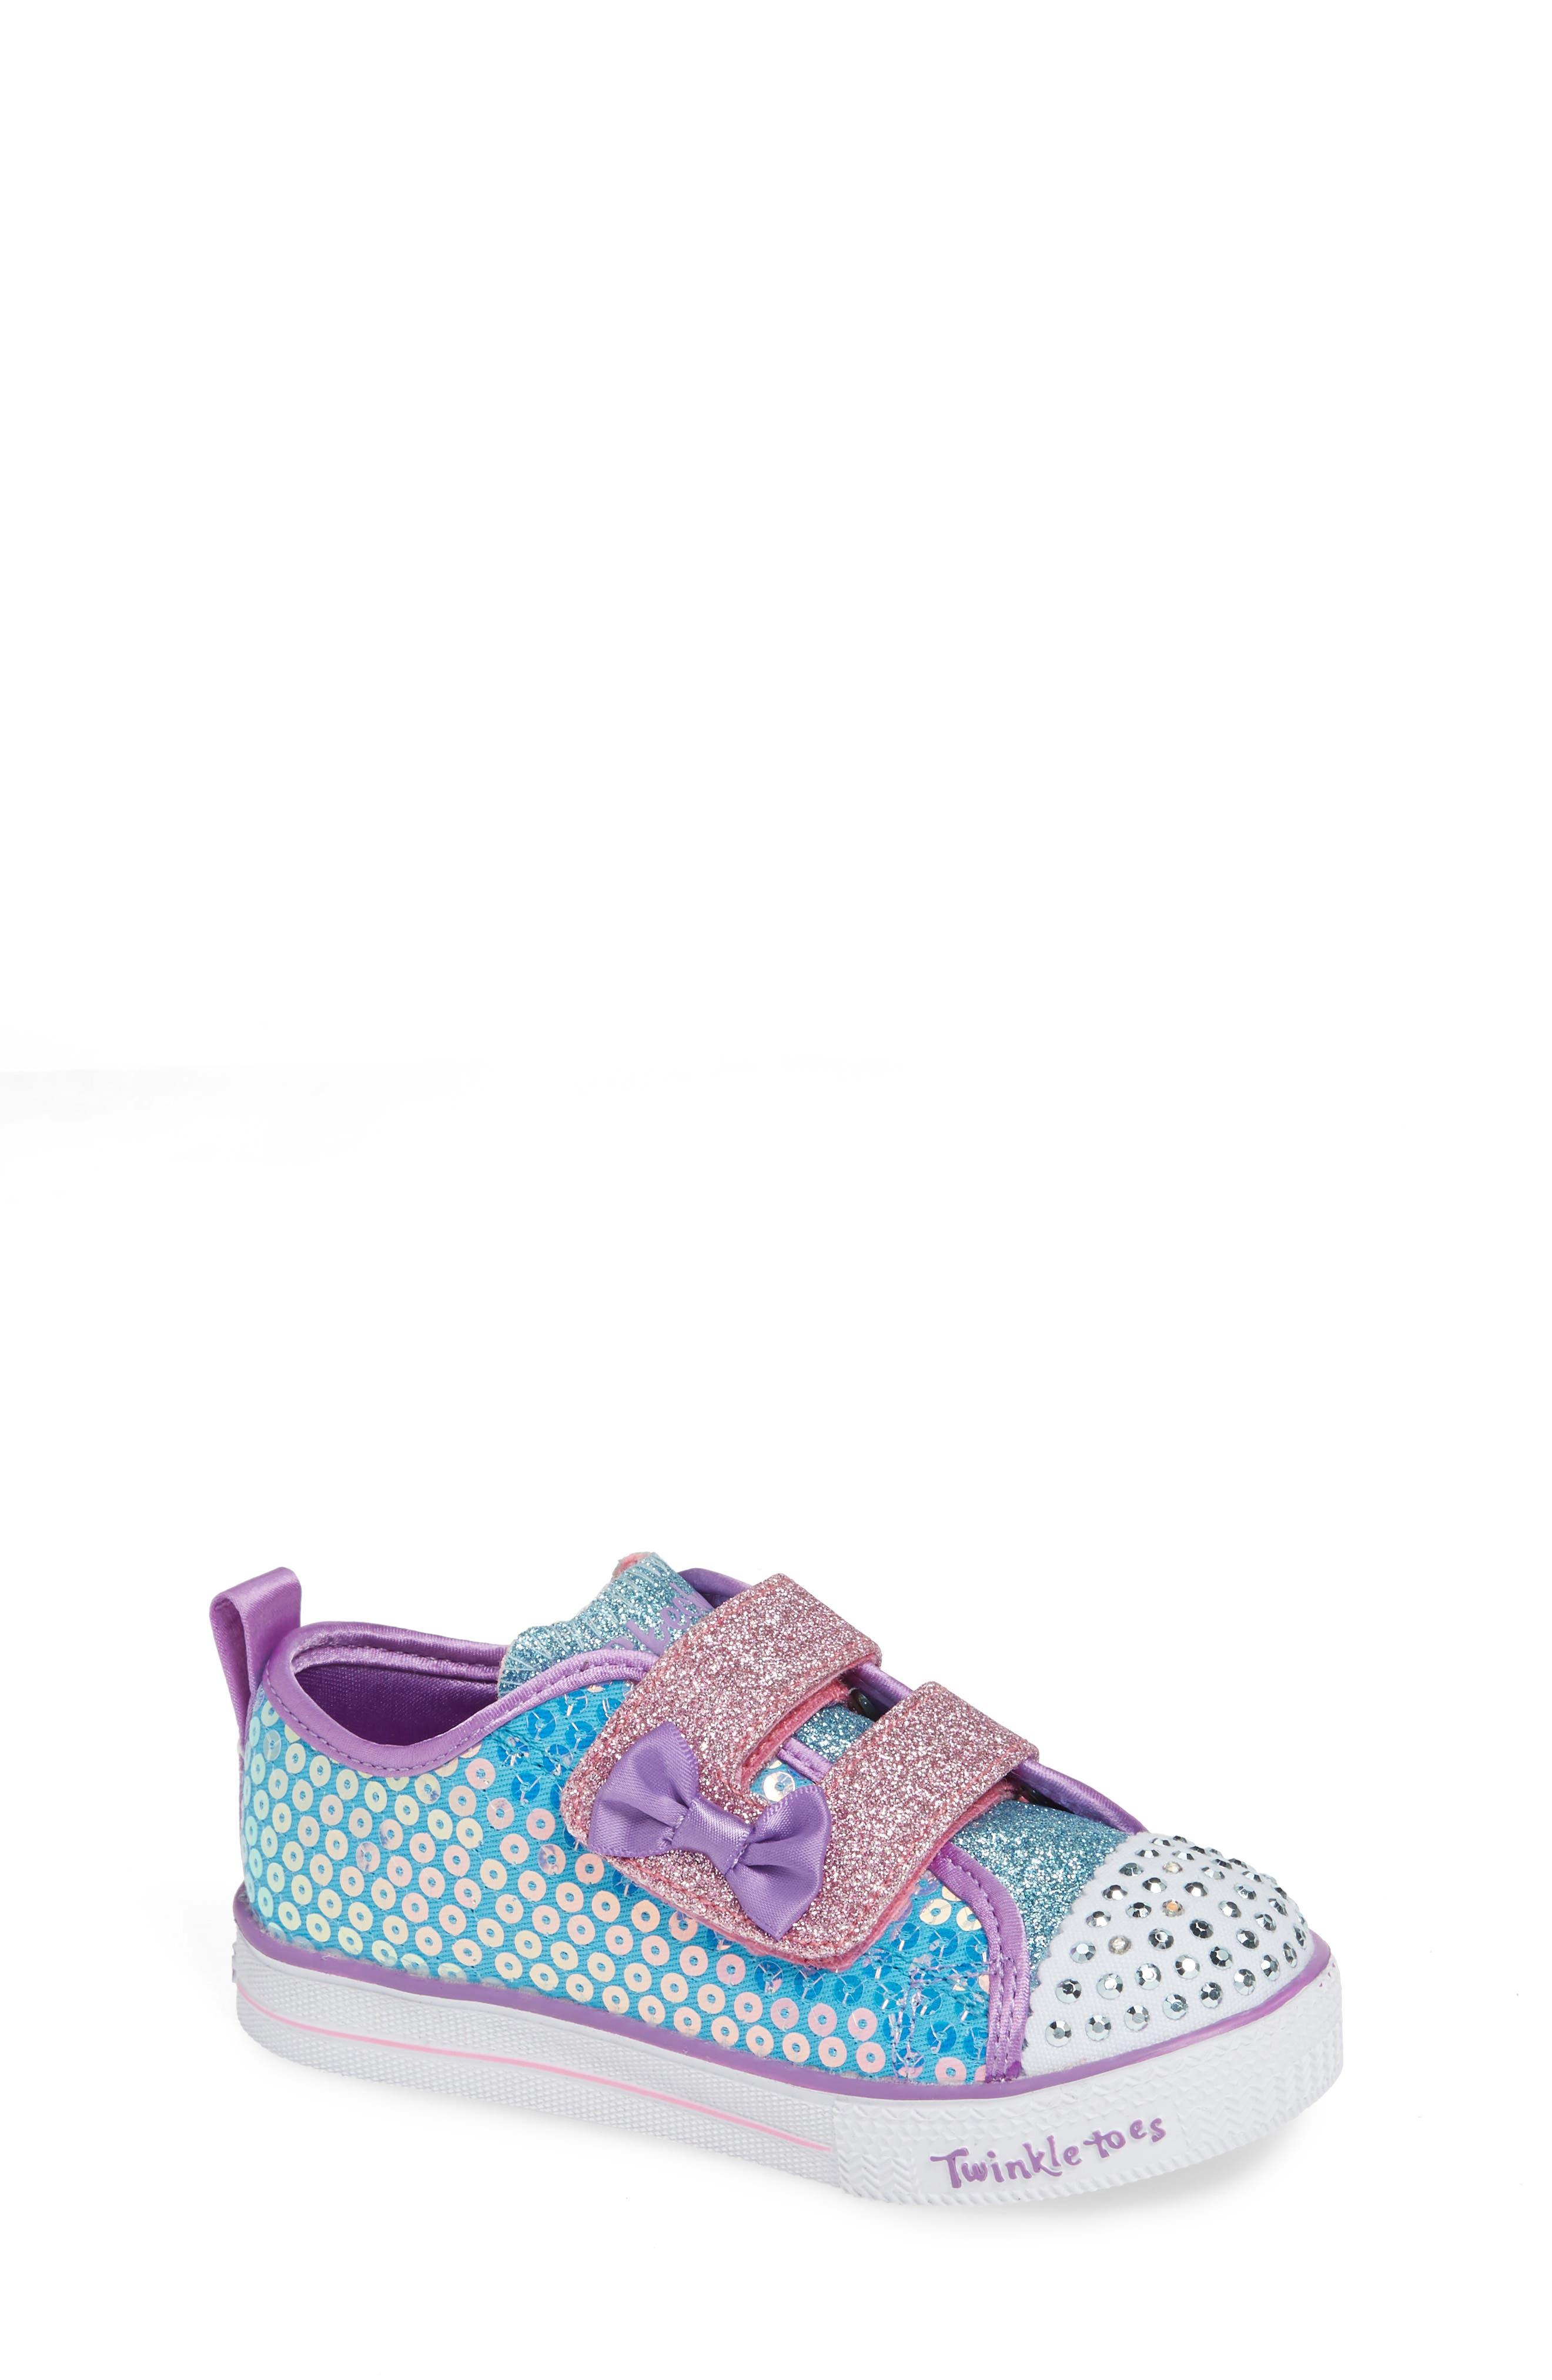 Shuffle Lite Glitter Sneaker,                         Main,                         color, TURQUOISE/MULTI